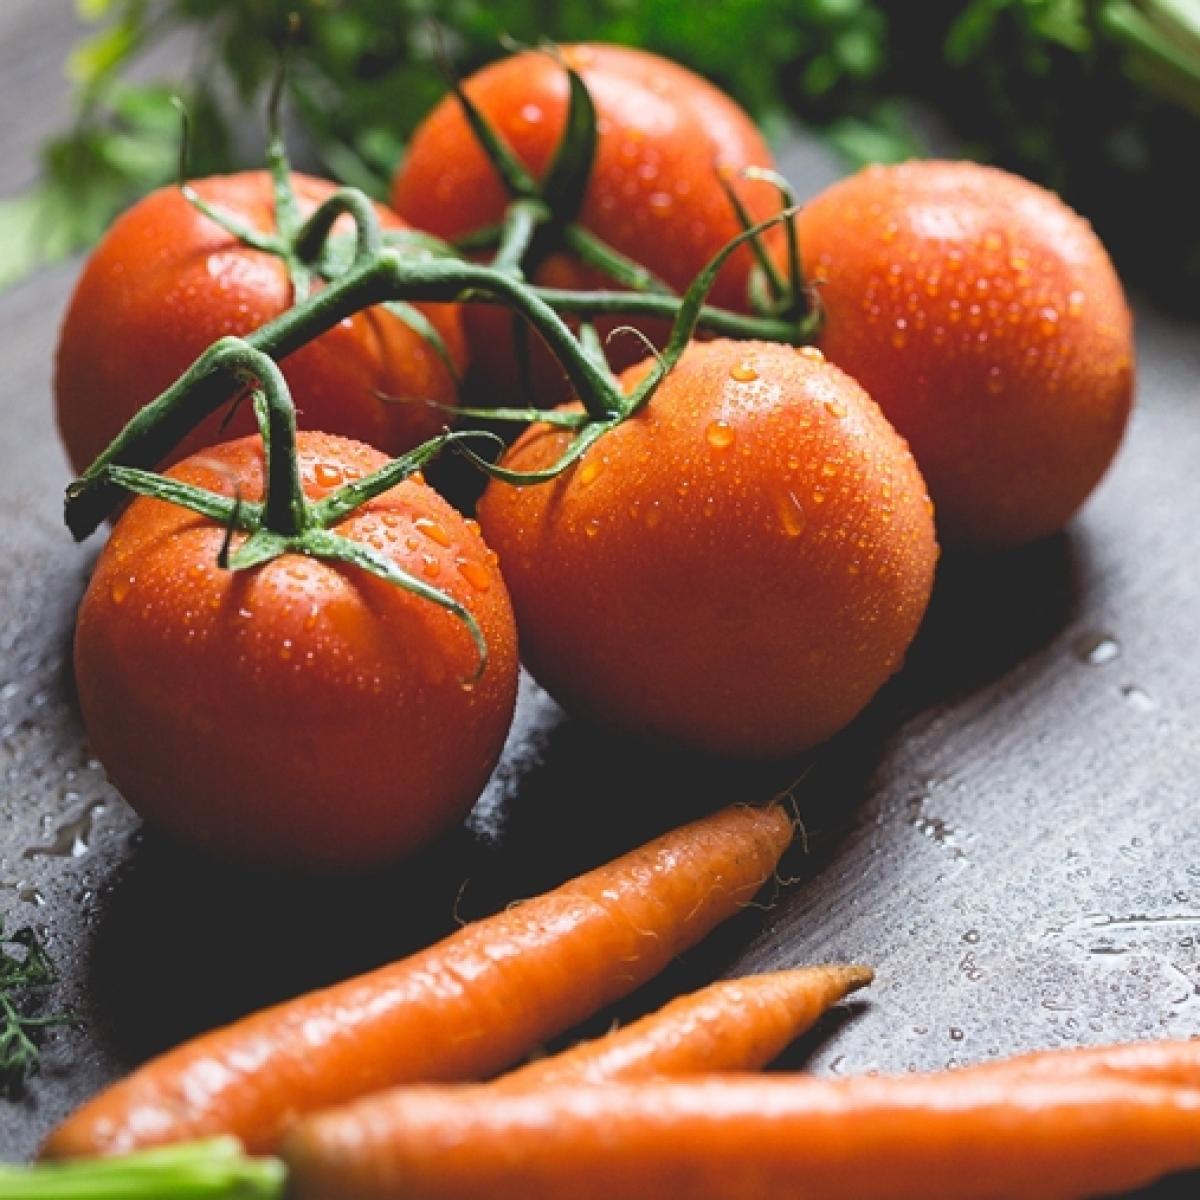 Order organic fruits, vegetables, fish online in Mumbai amid COVID-19 lockdown